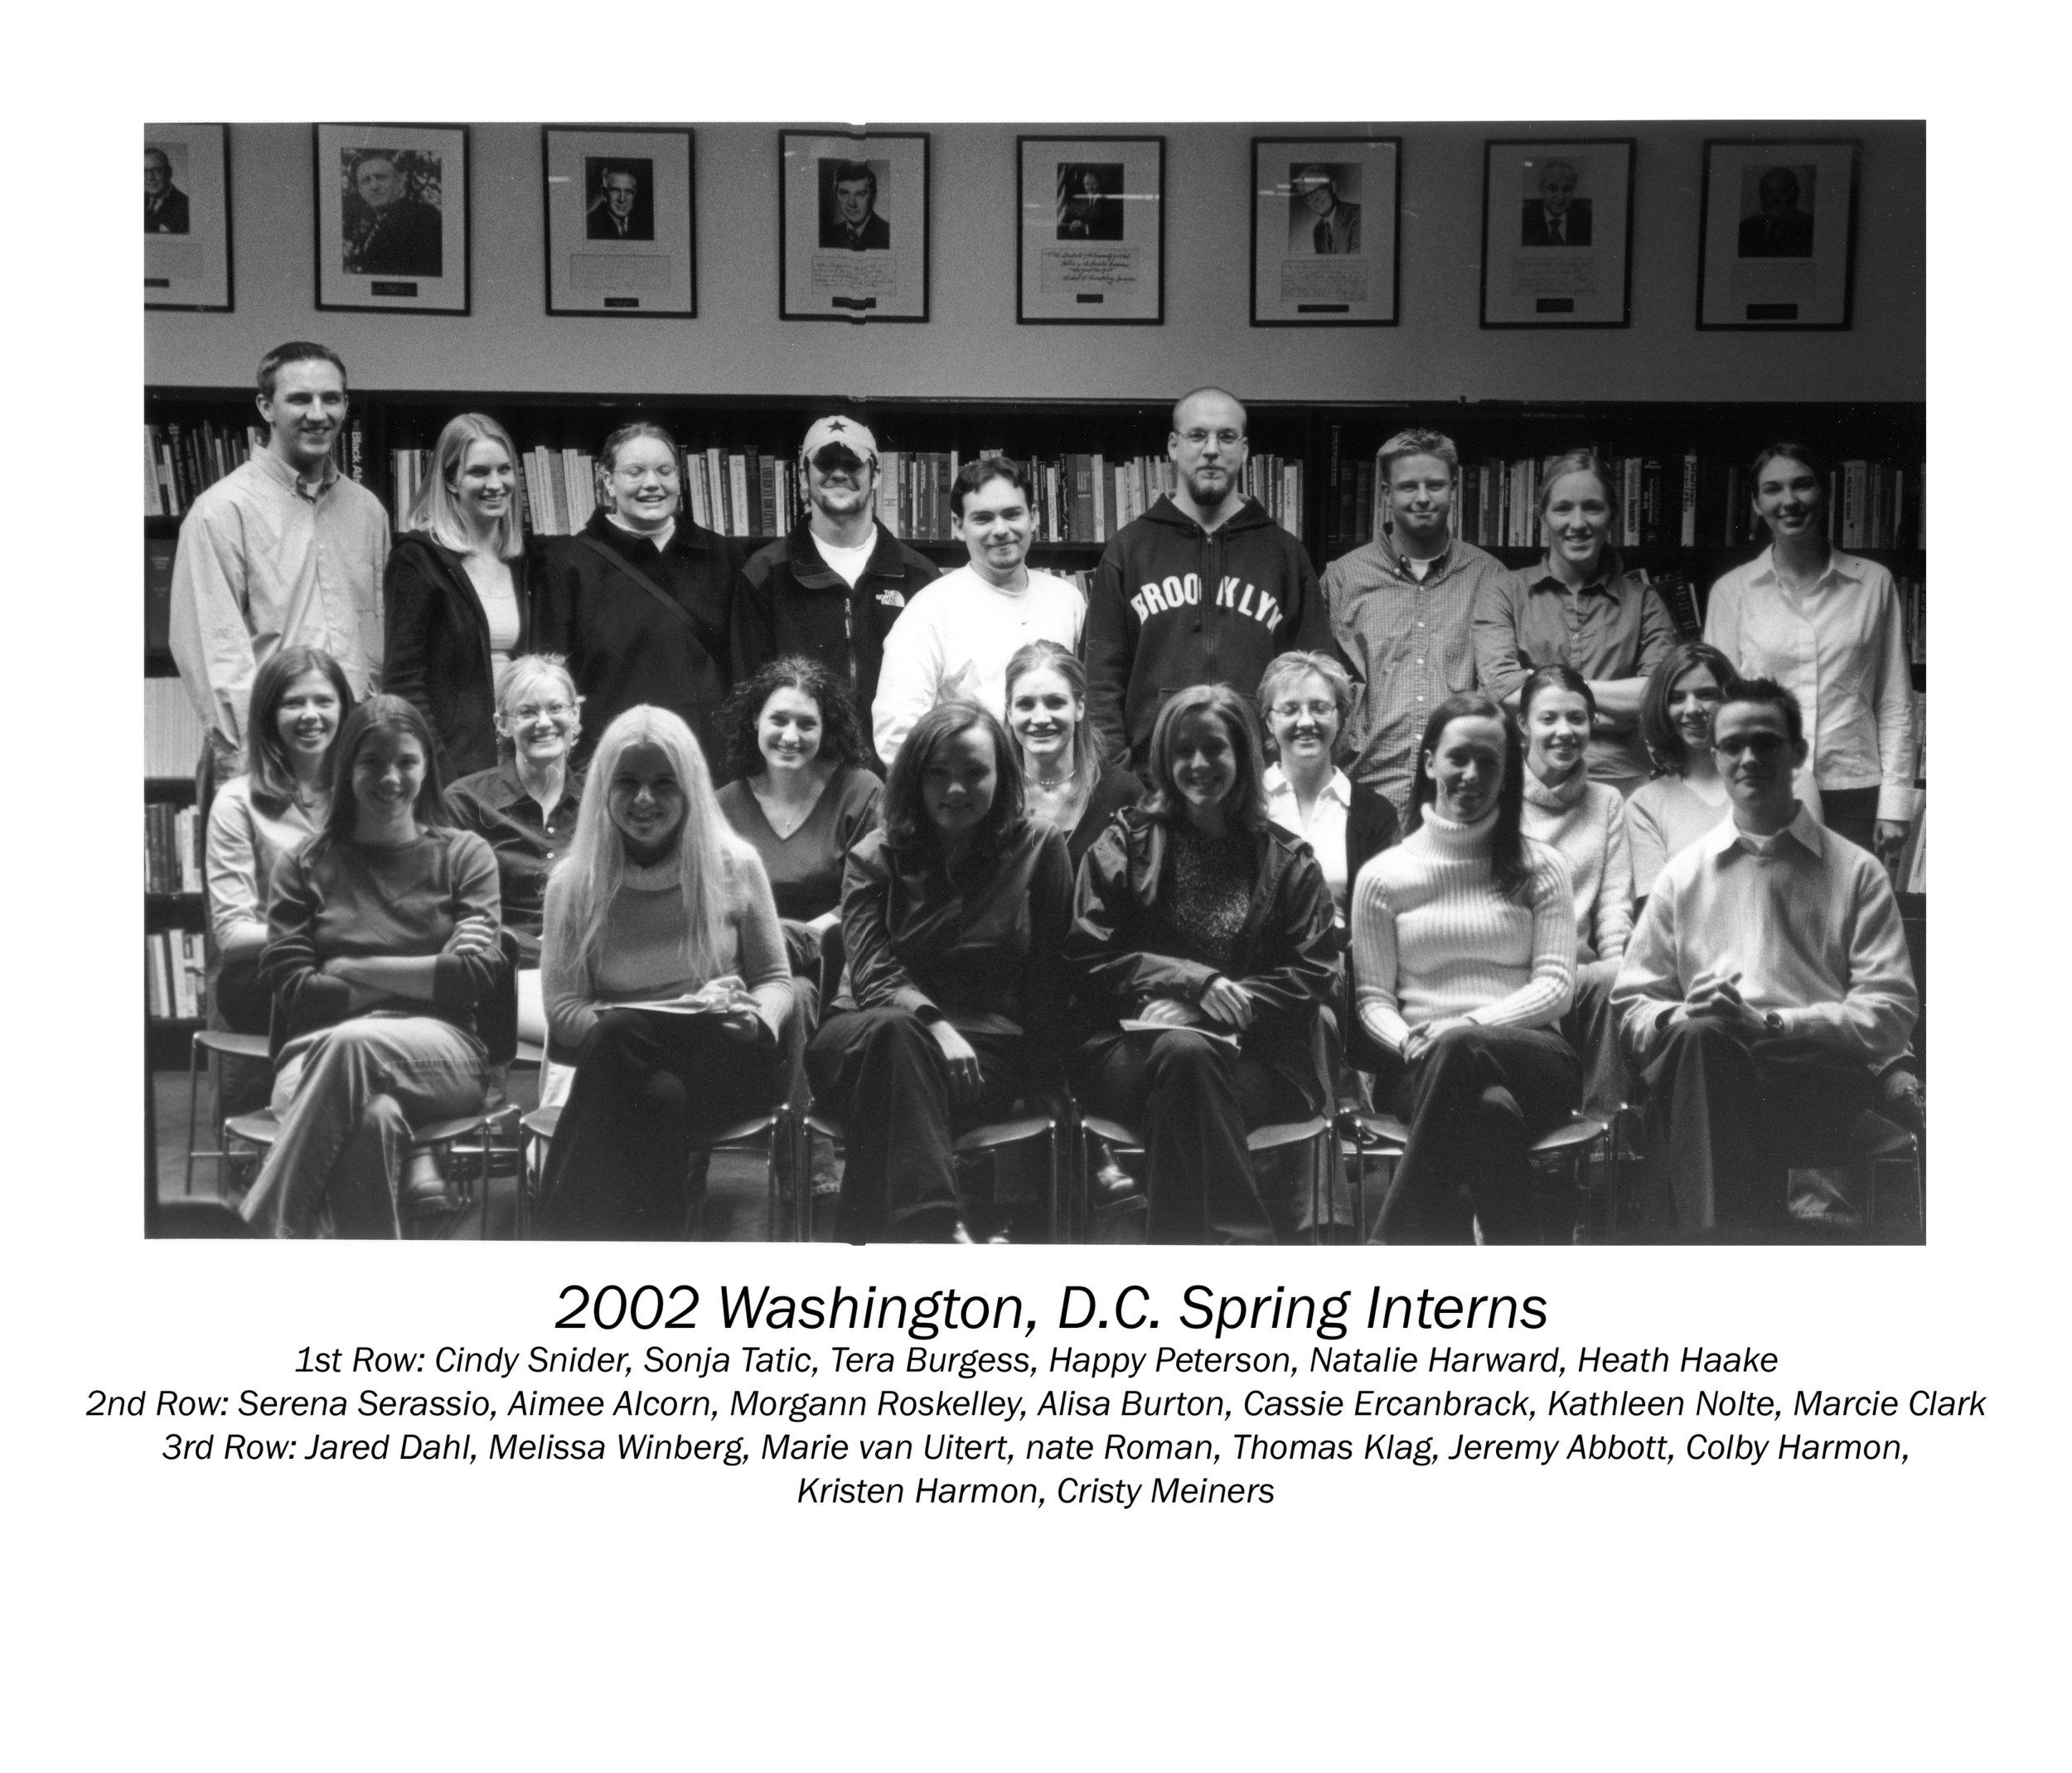 2002 Washington, D.C. Spring Interns copy.jpg